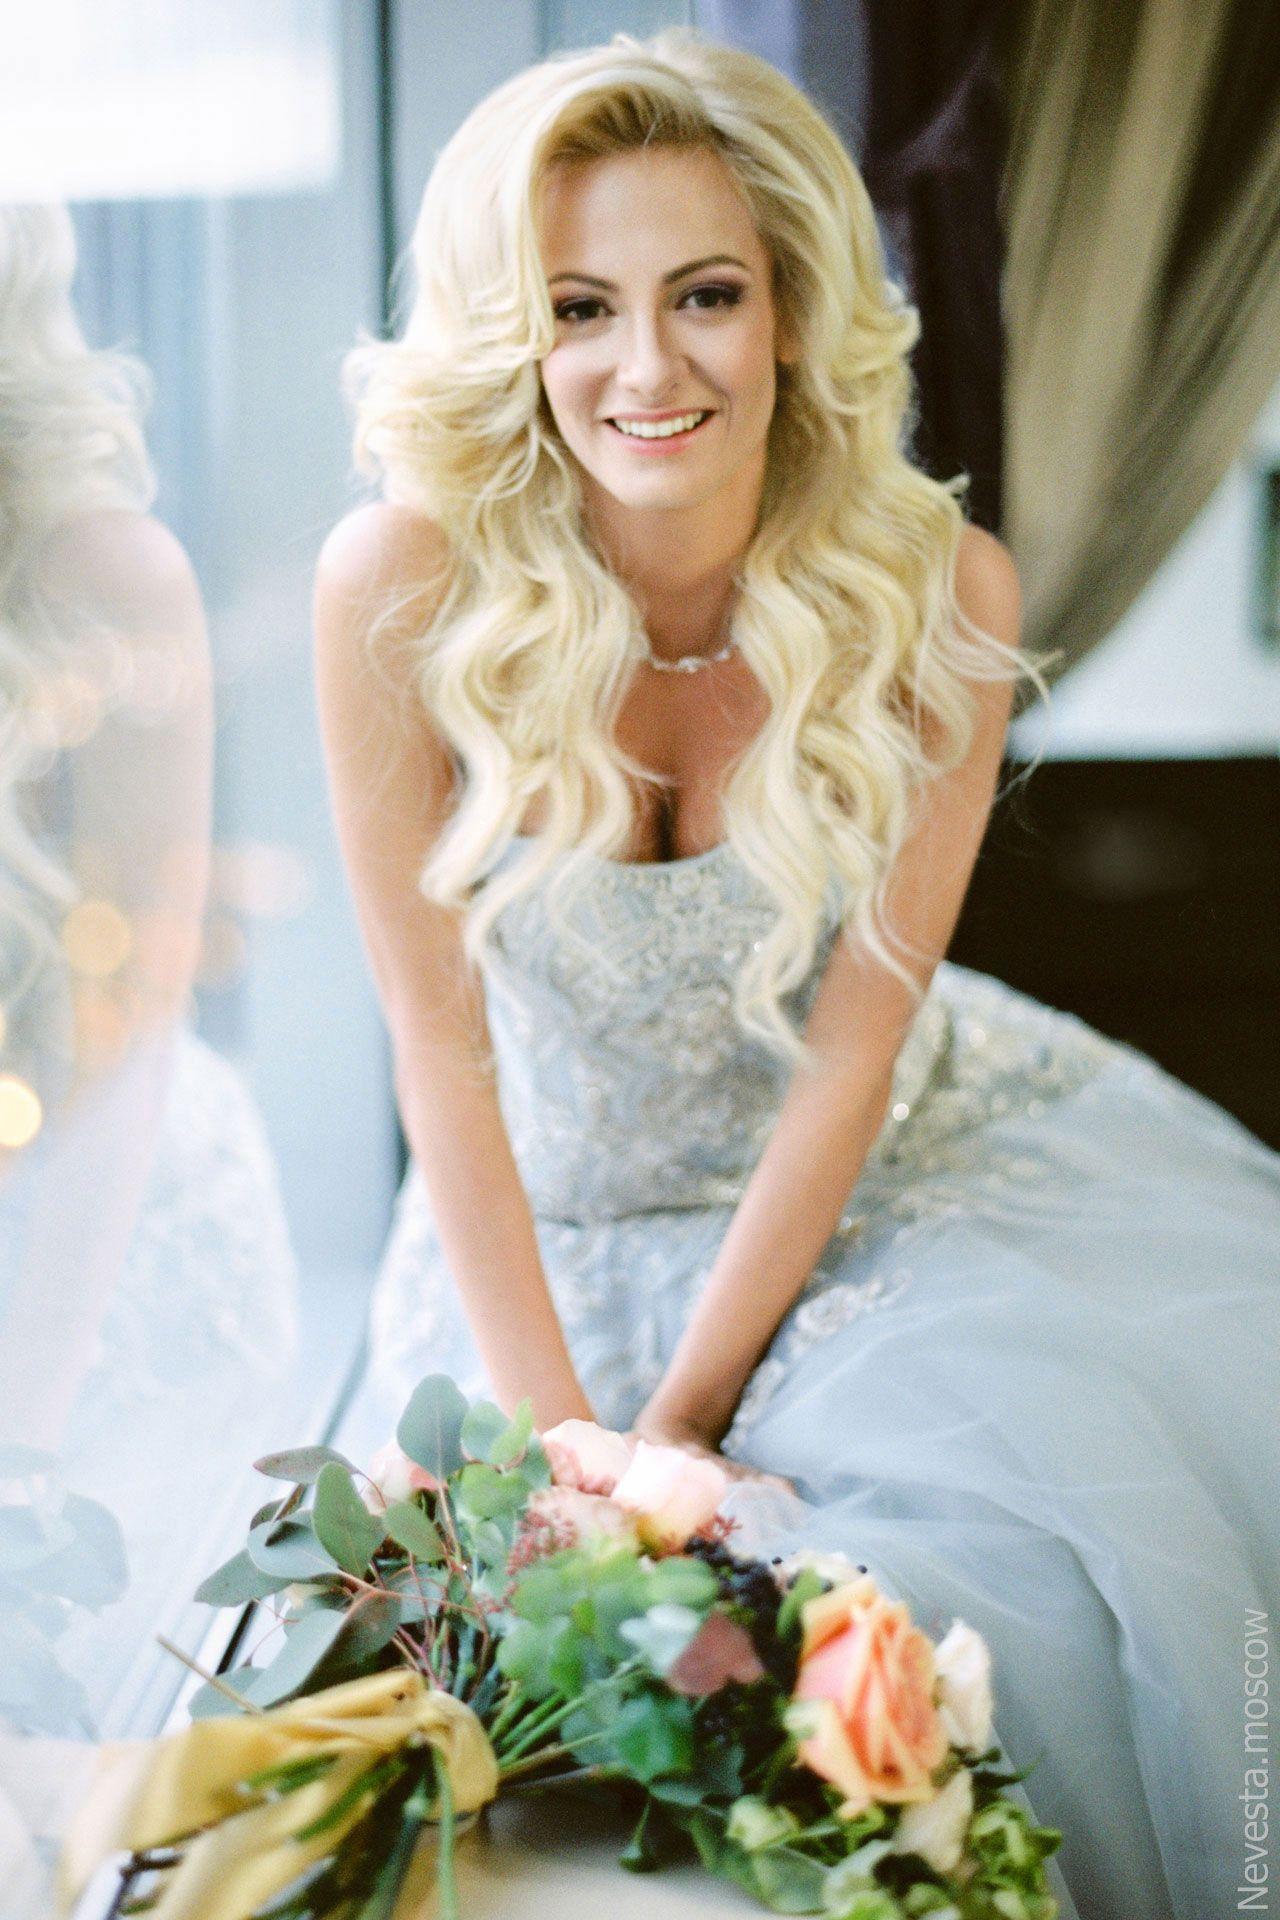 актриса Полина Максимова в свадебном платье невеста фото 6